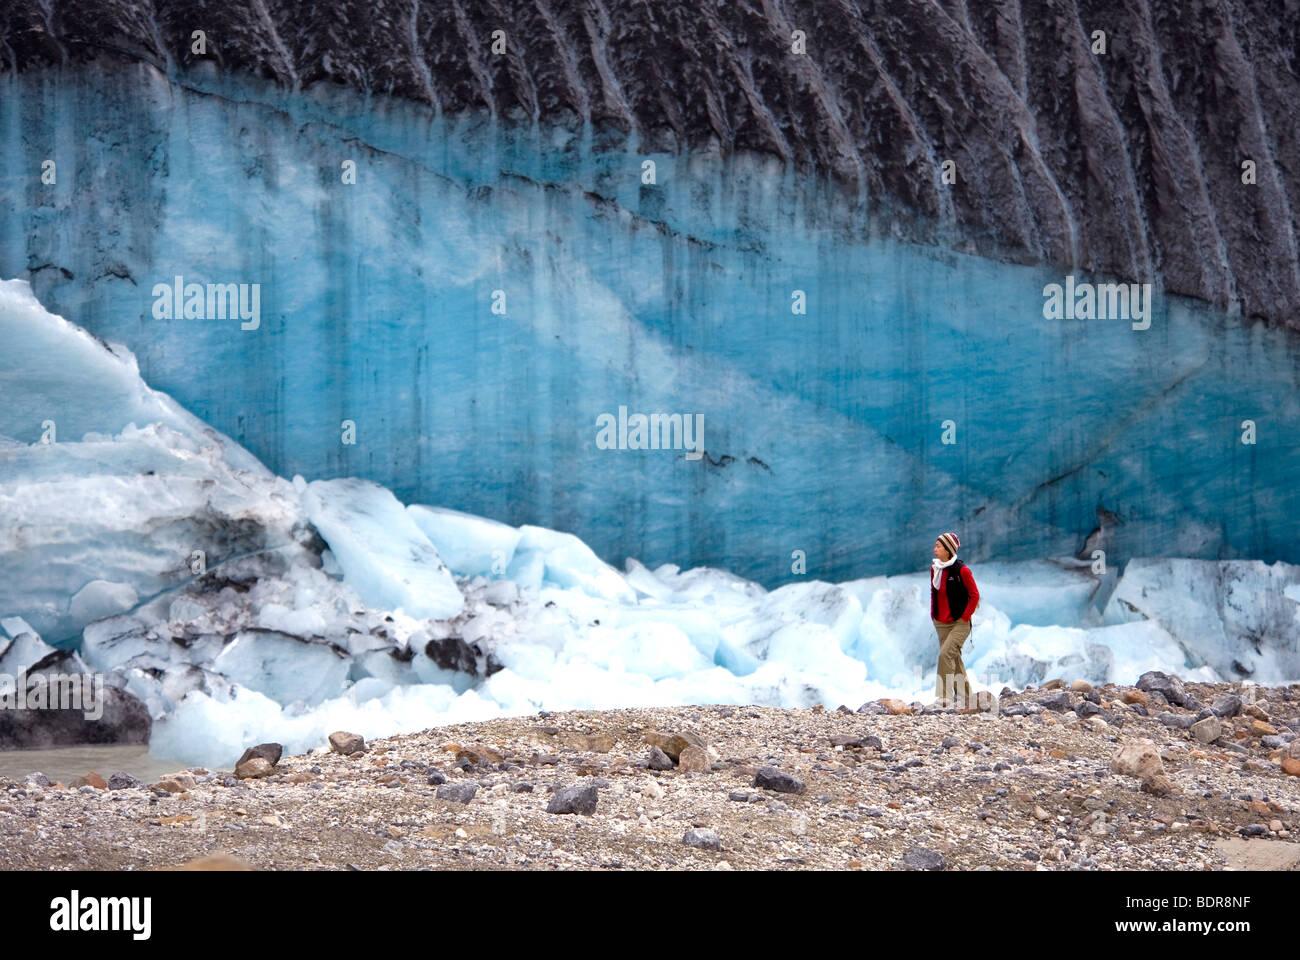 Calving section of glacier, Athabasca Glacier, Jasper National Park, Alberta, Canada - Stock Image